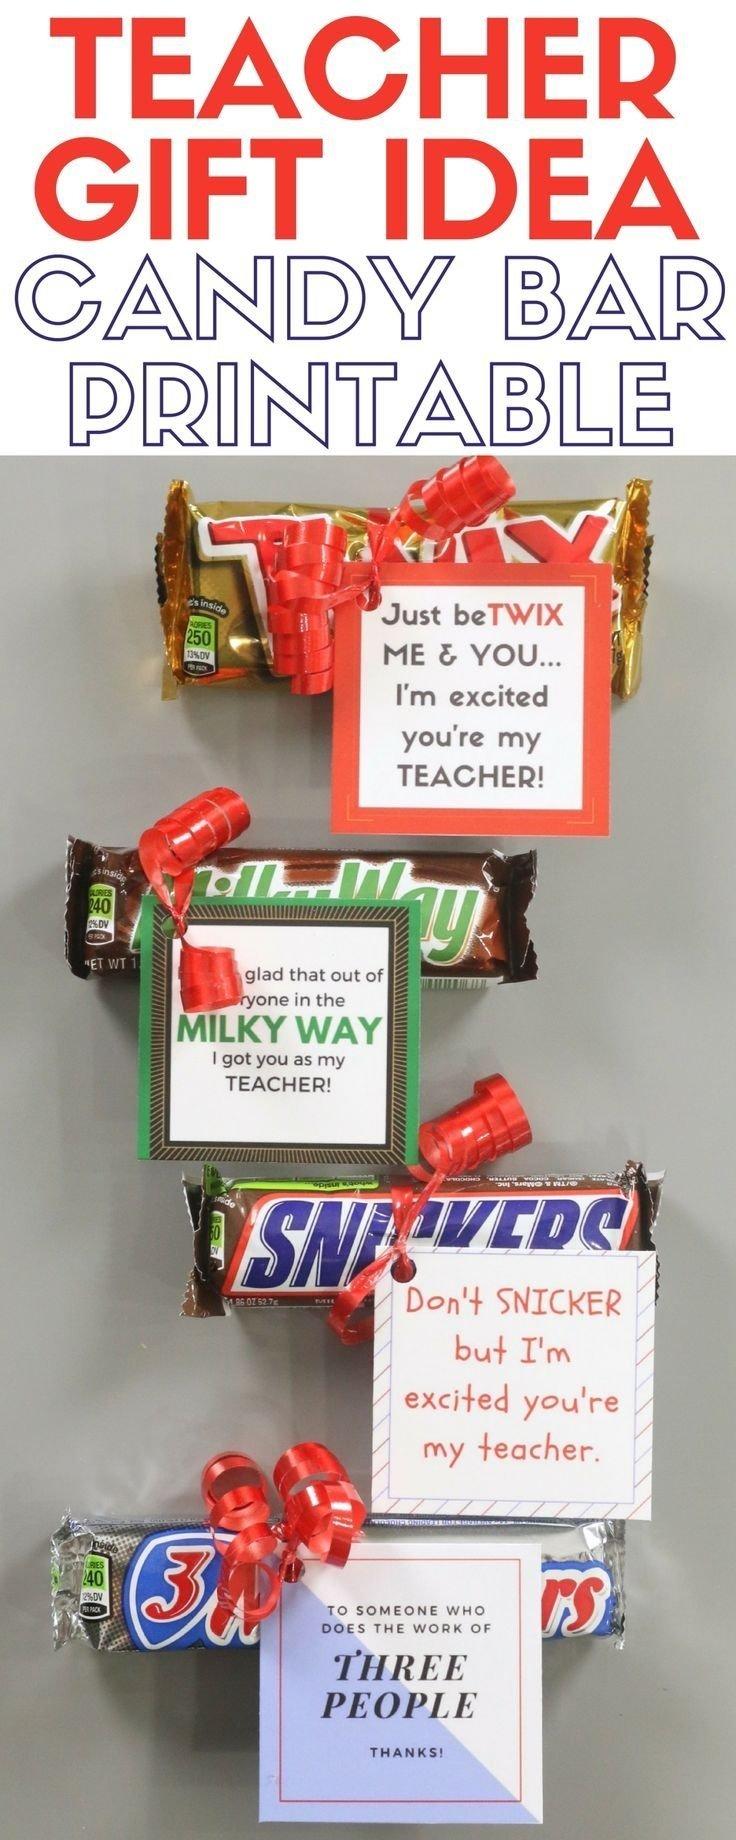 213 best teacher gift ideas images on pinterest | presents for